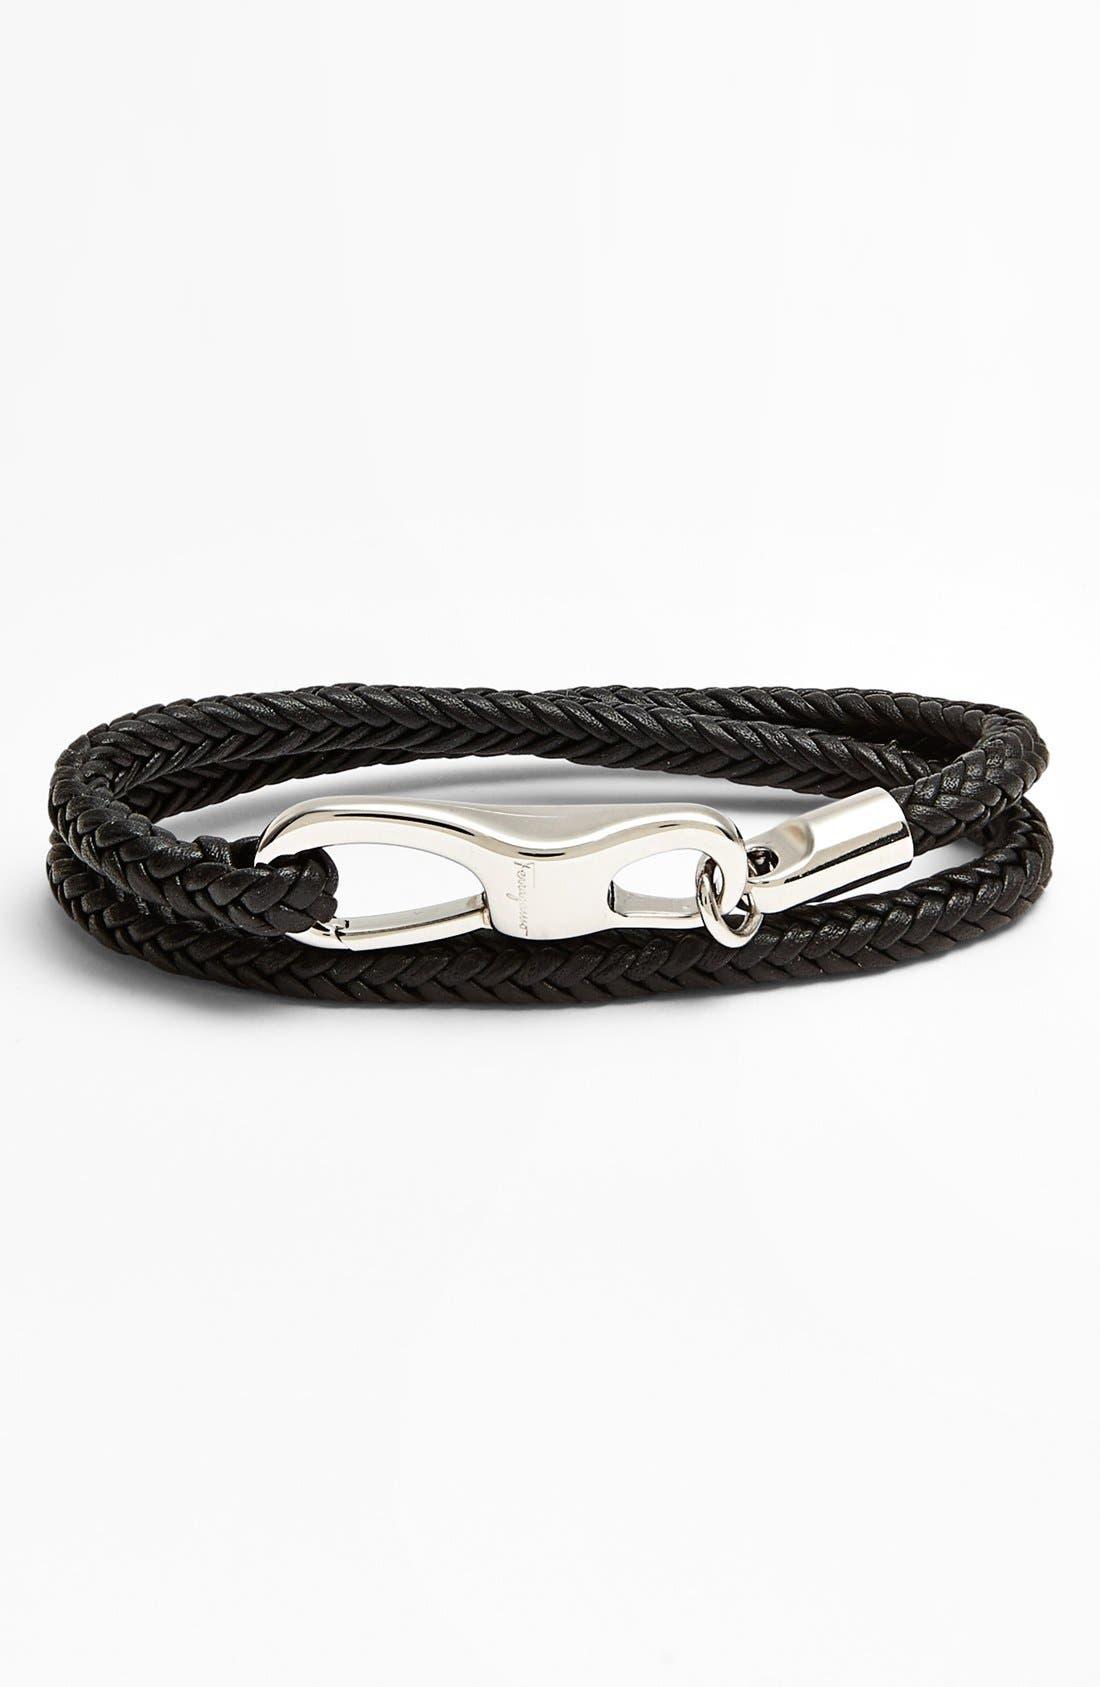 Alternate Image 1 Selected - Salvatore Ferragamo Braided Leather Bracelet